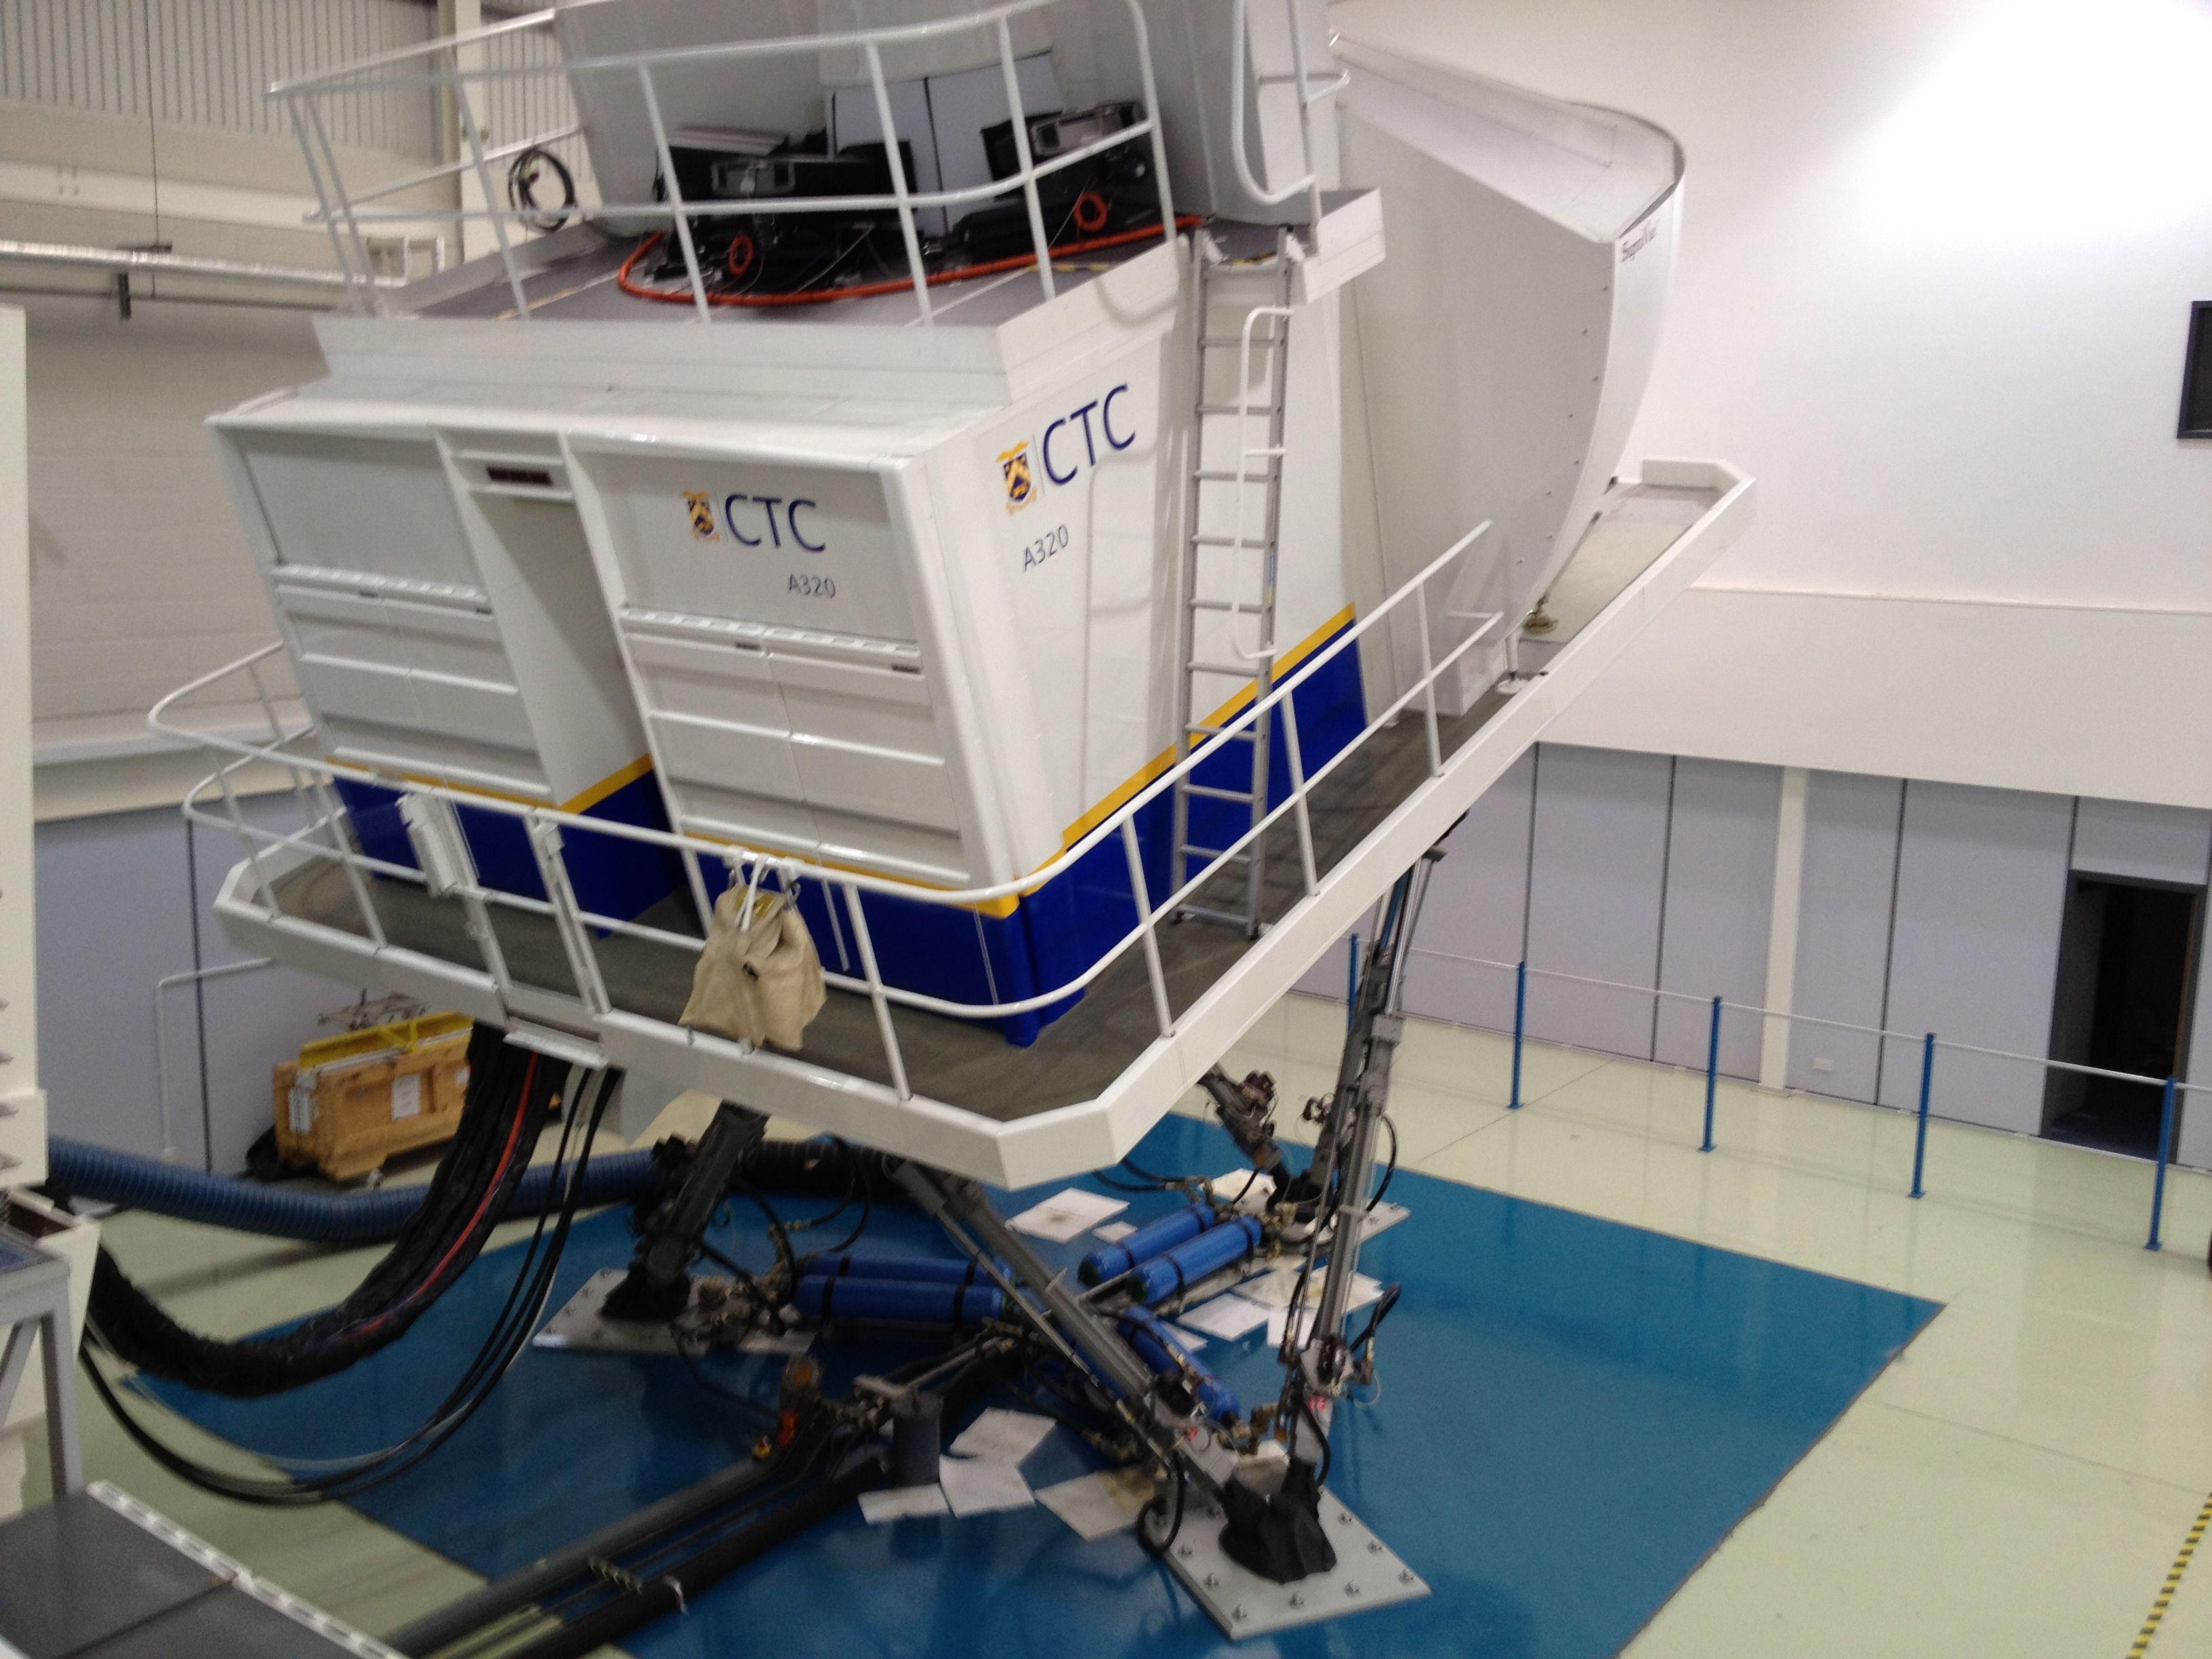 flight simulator chair motion plaid wingback chairs airbus full journeym4n